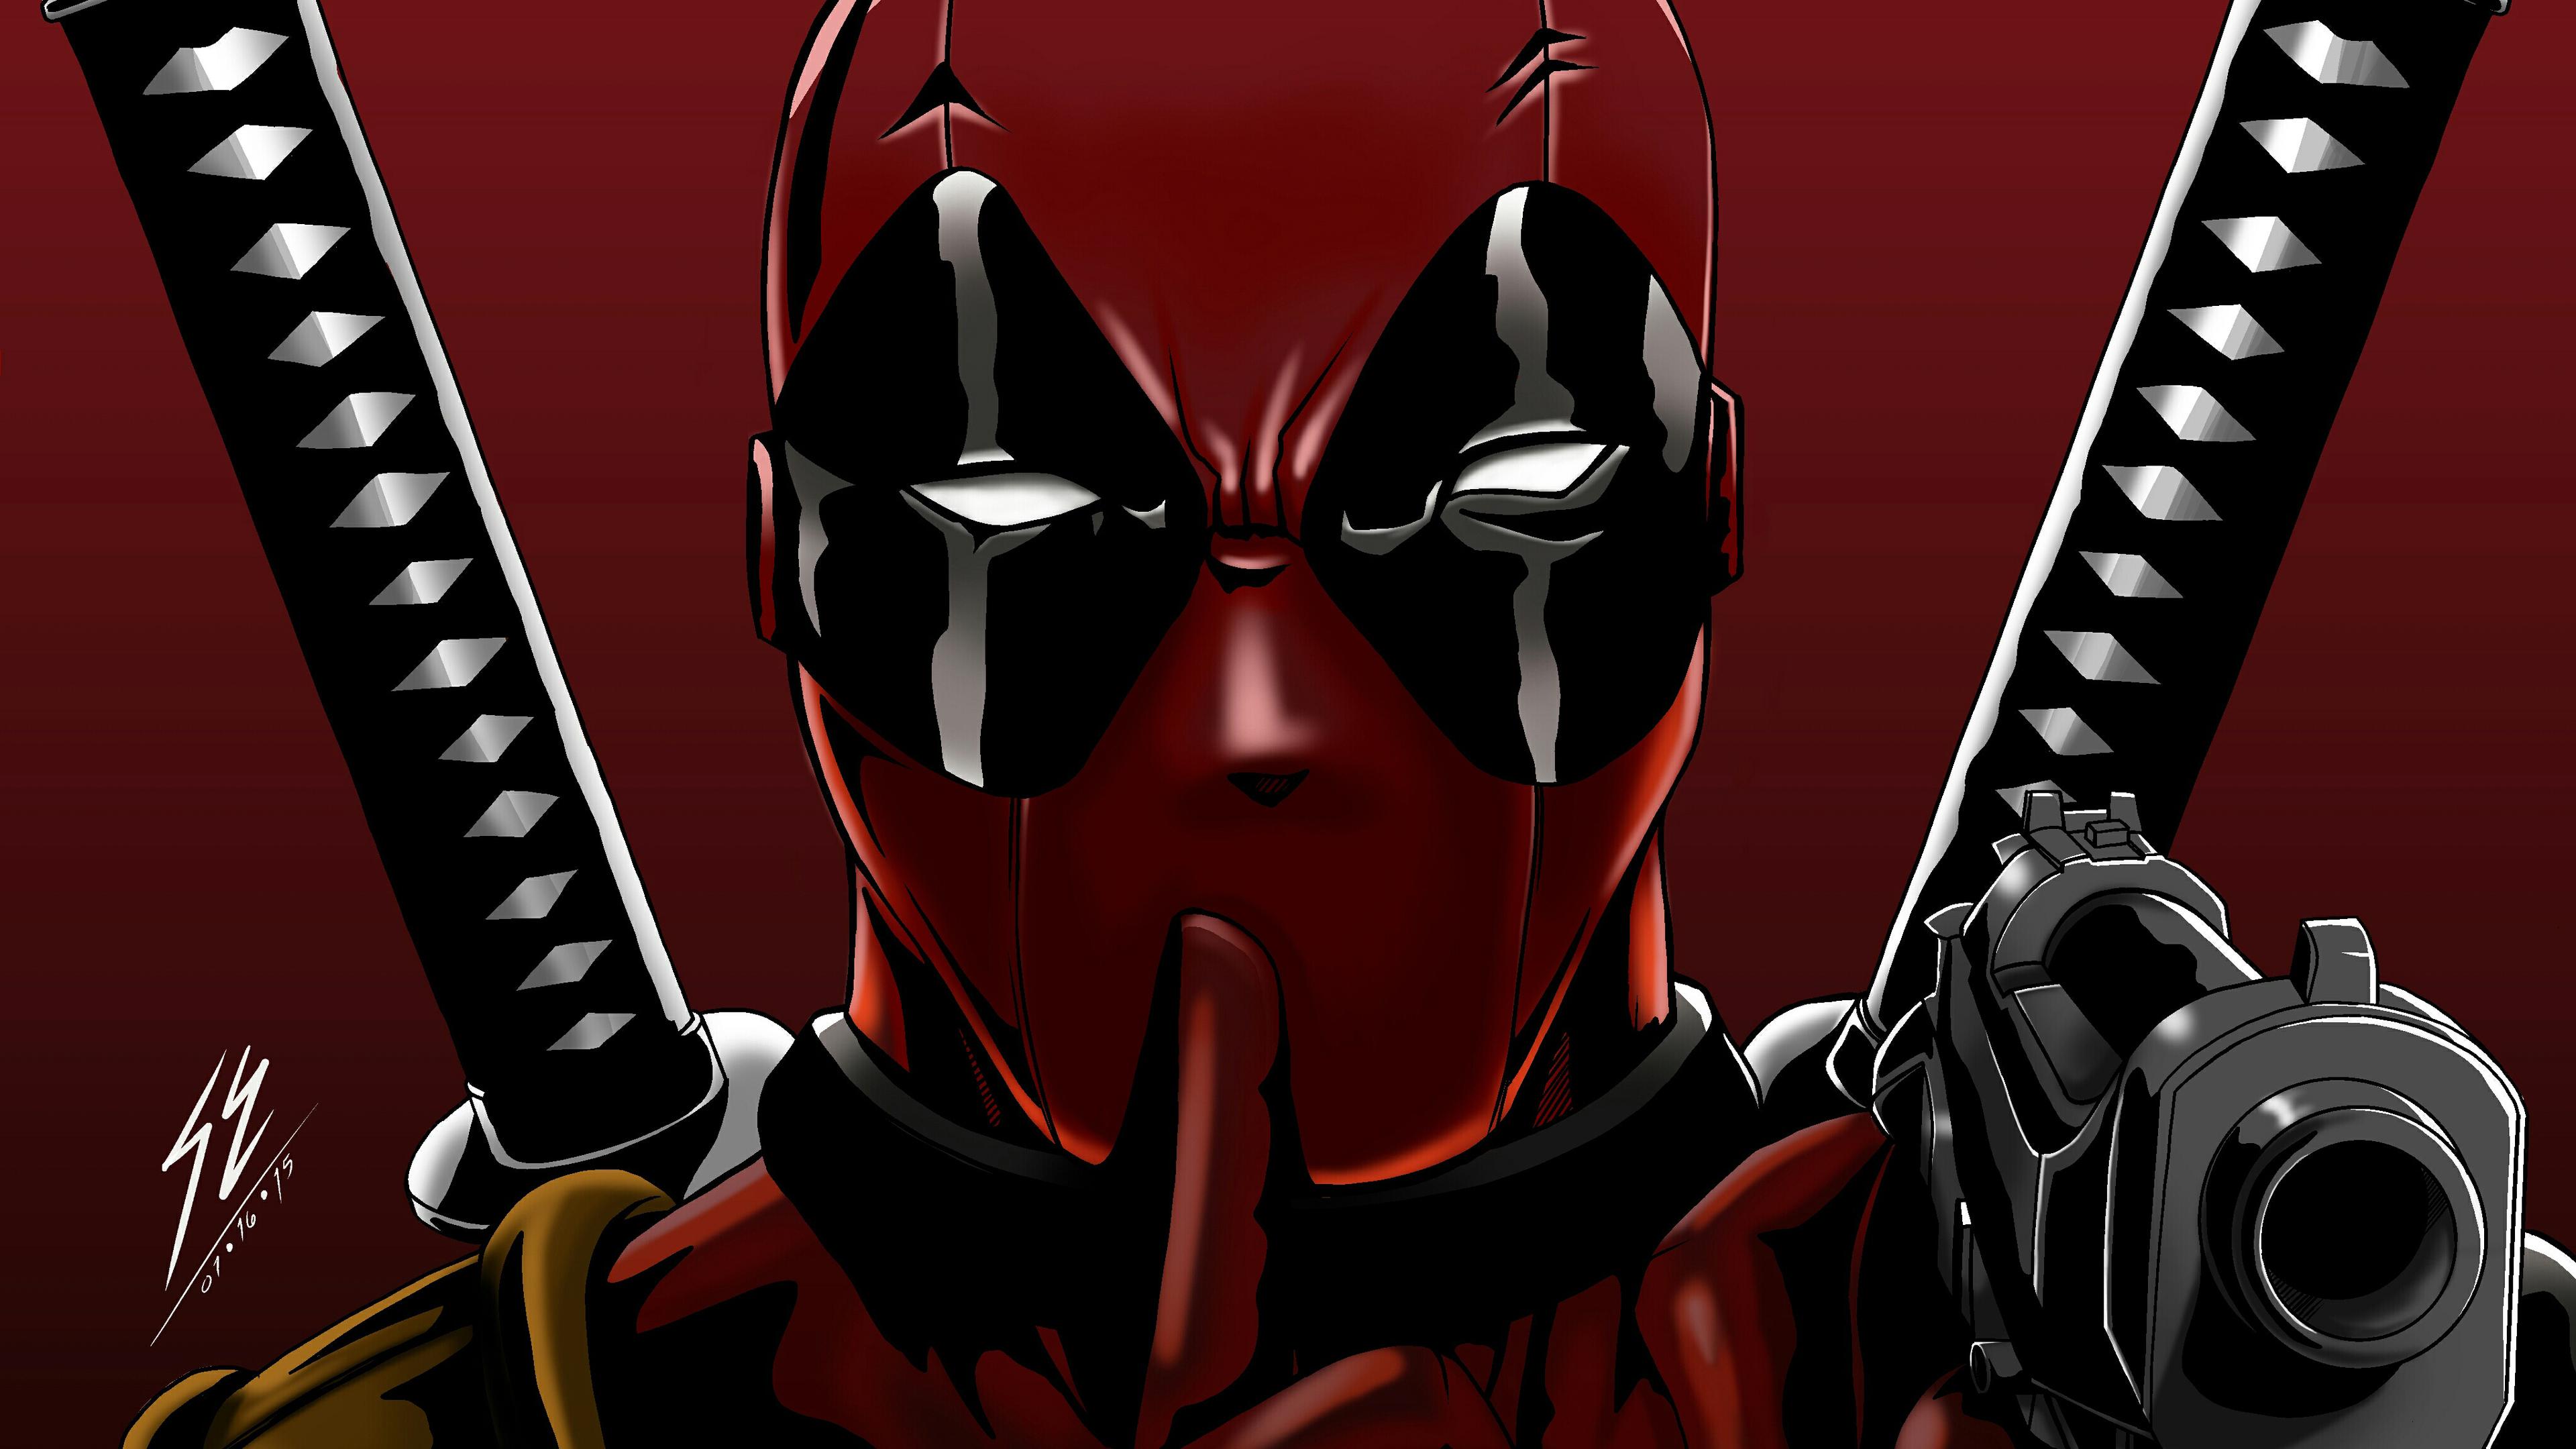 Deadpool Digital Arts 4k superheroes wallpapers, hd ...